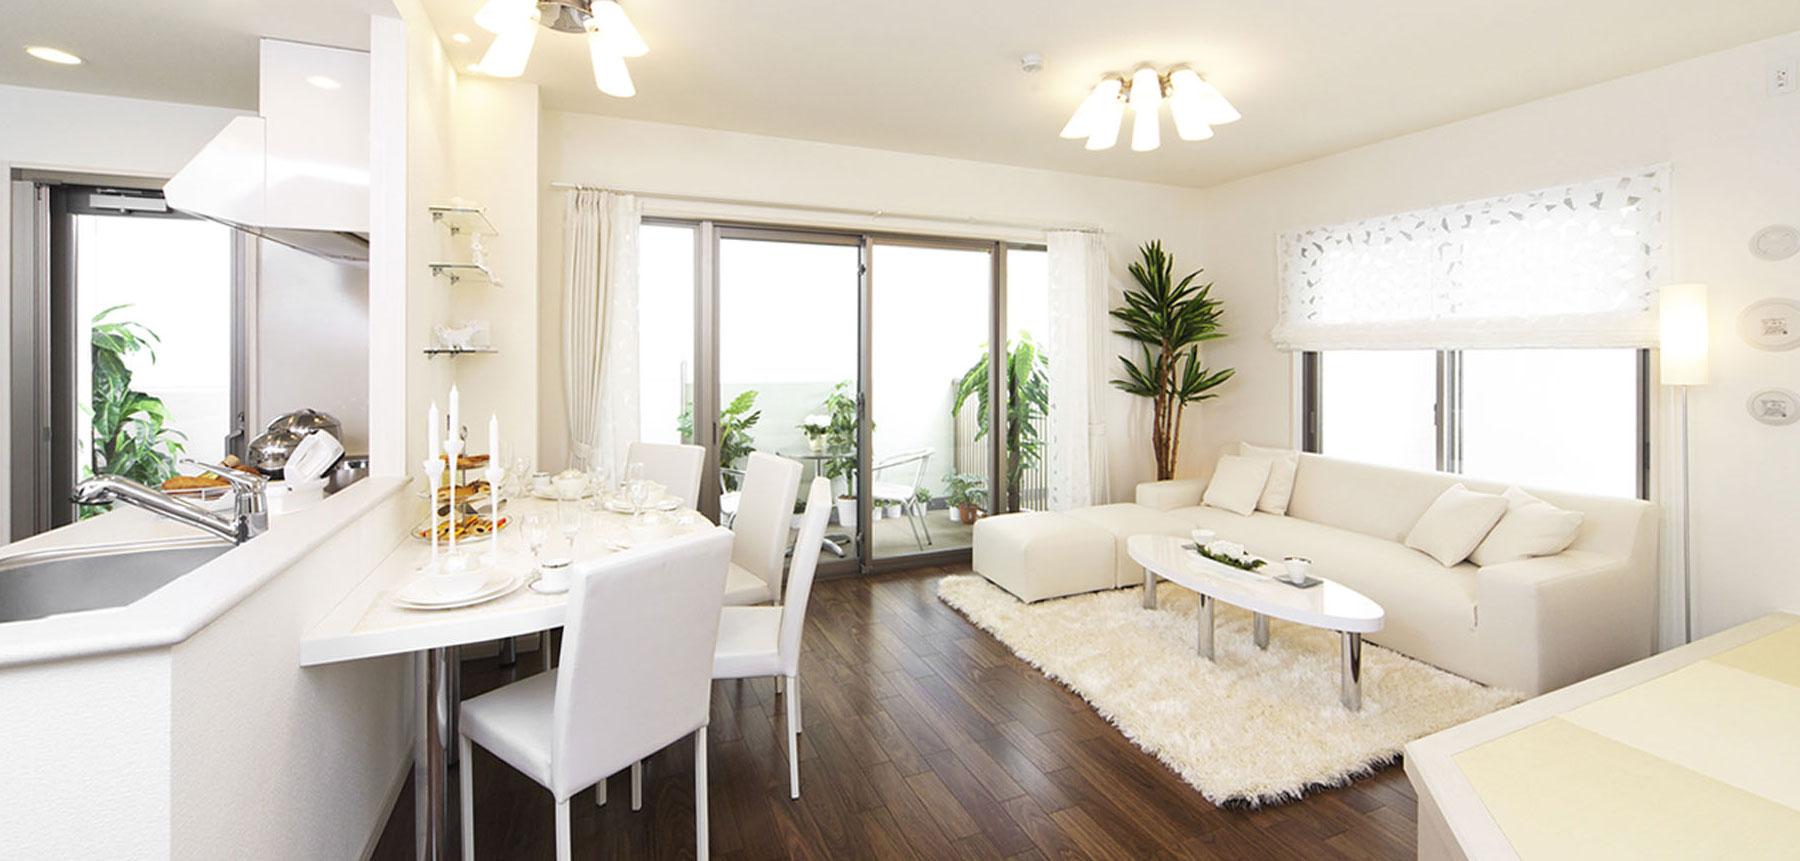 magasin de meuble le mans. Black Bedroom Furniture Sets. Home Design Ideas